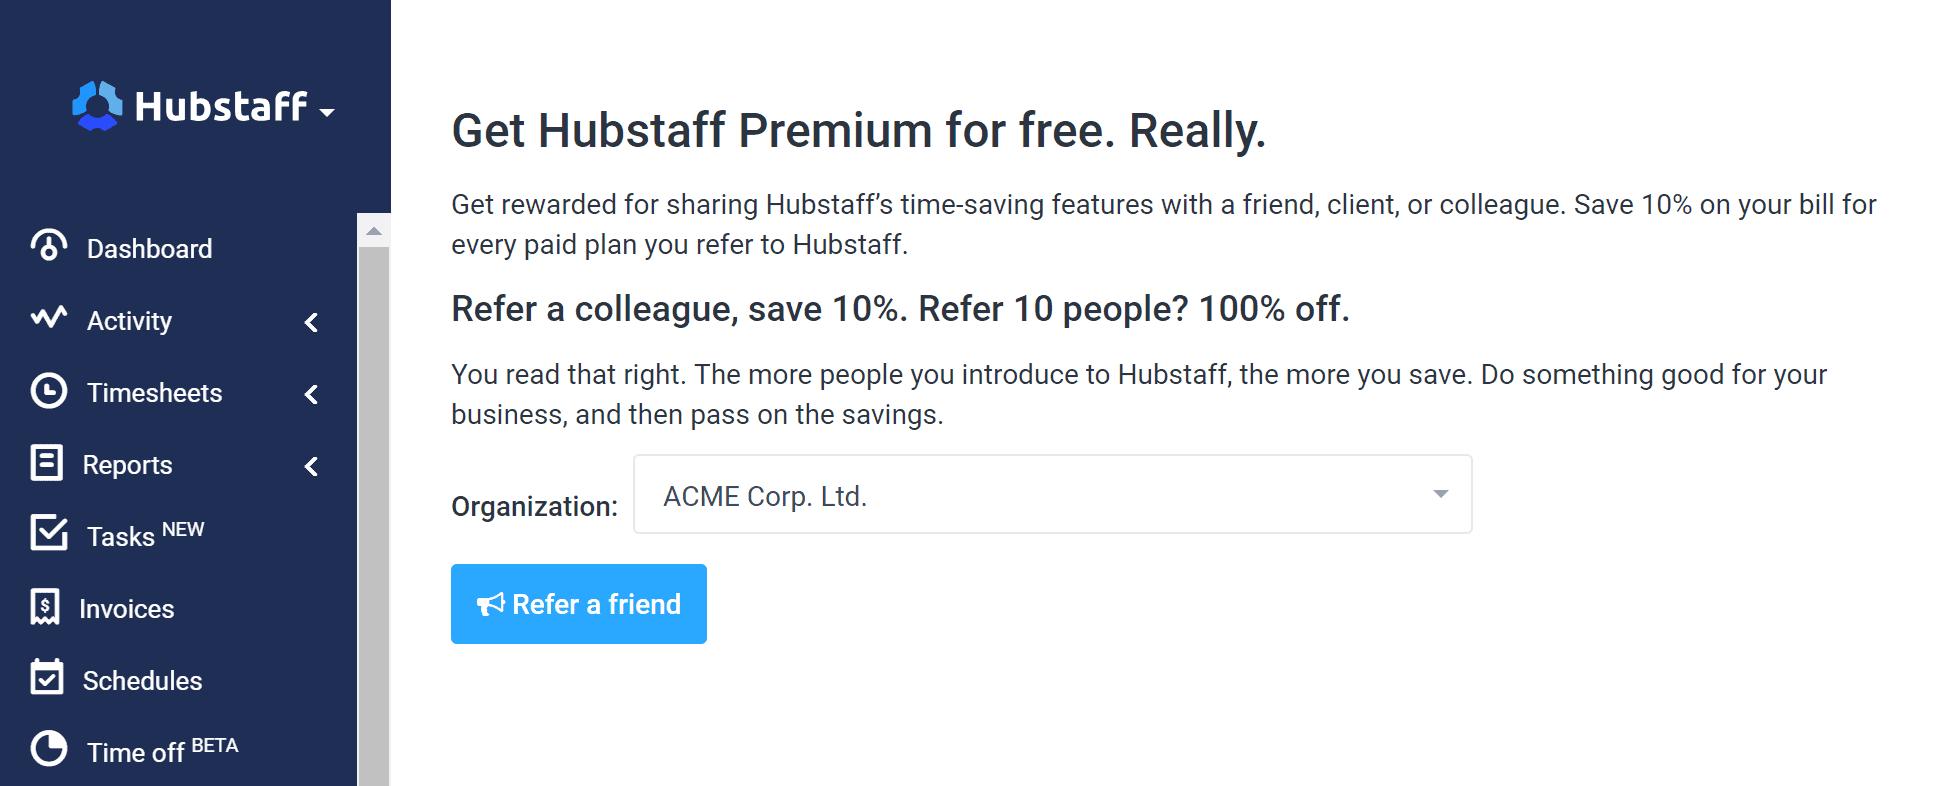 how to get hubstaff premium free